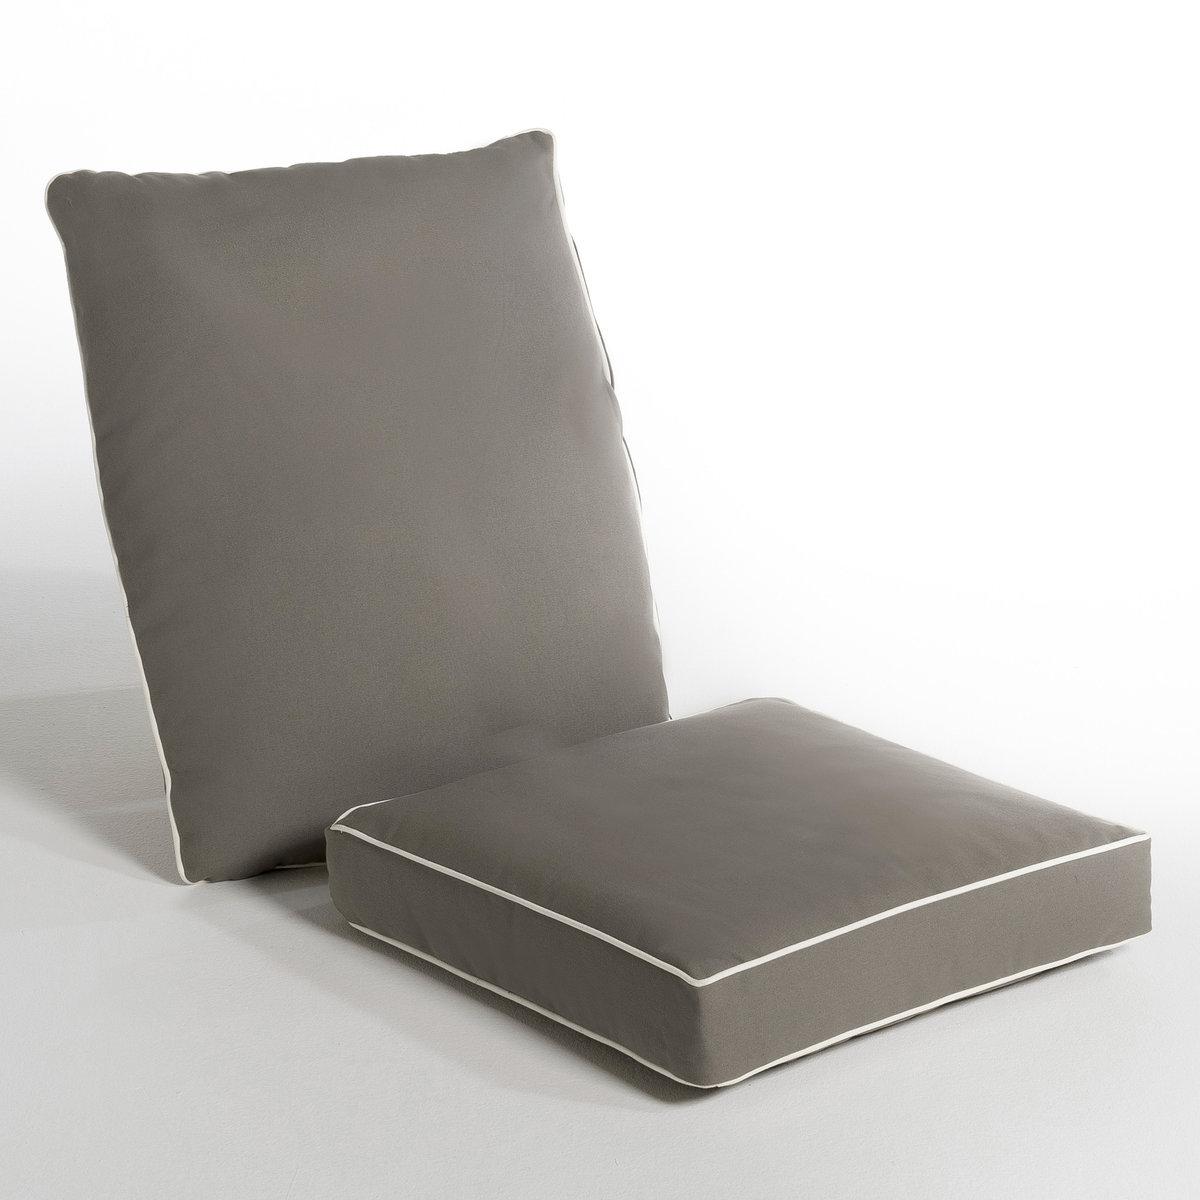 Подушки для кресла  Meltem пена top house д плит свч печей 500мл